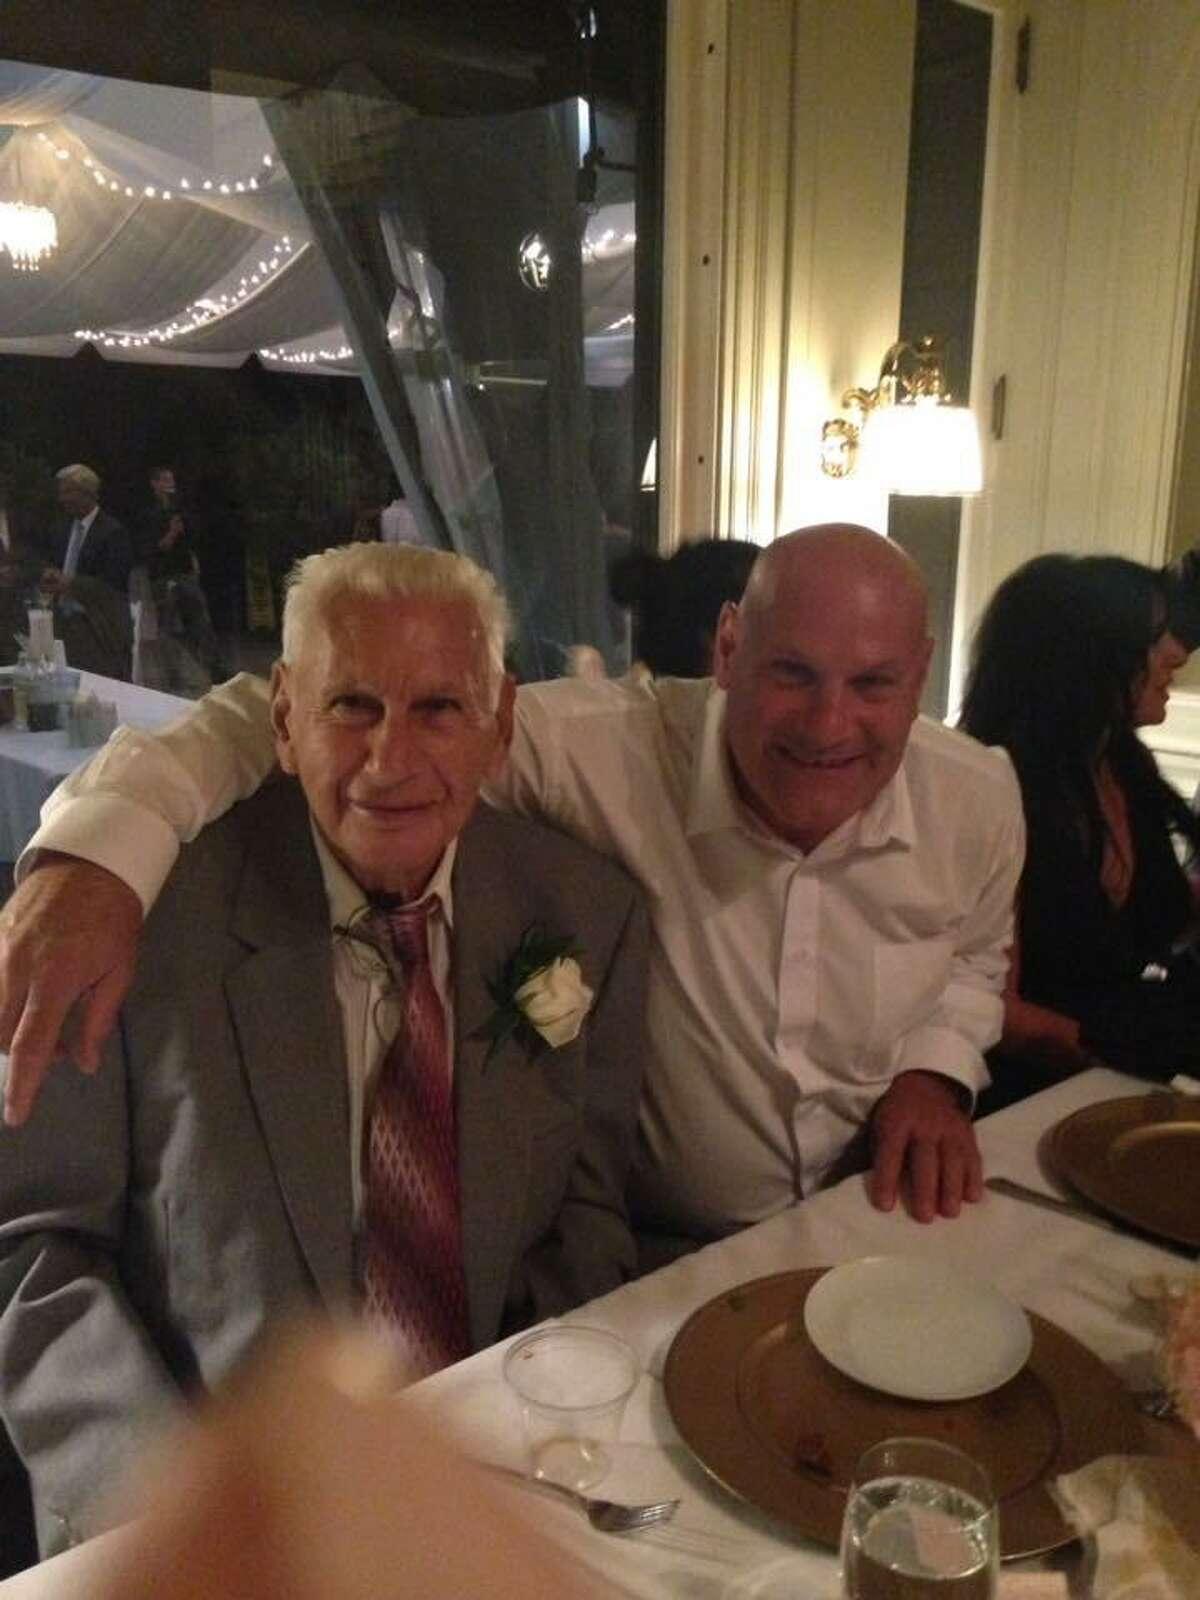 East Haven Mayor Joe Carfora, right, with his father, Al Carfora Jr.